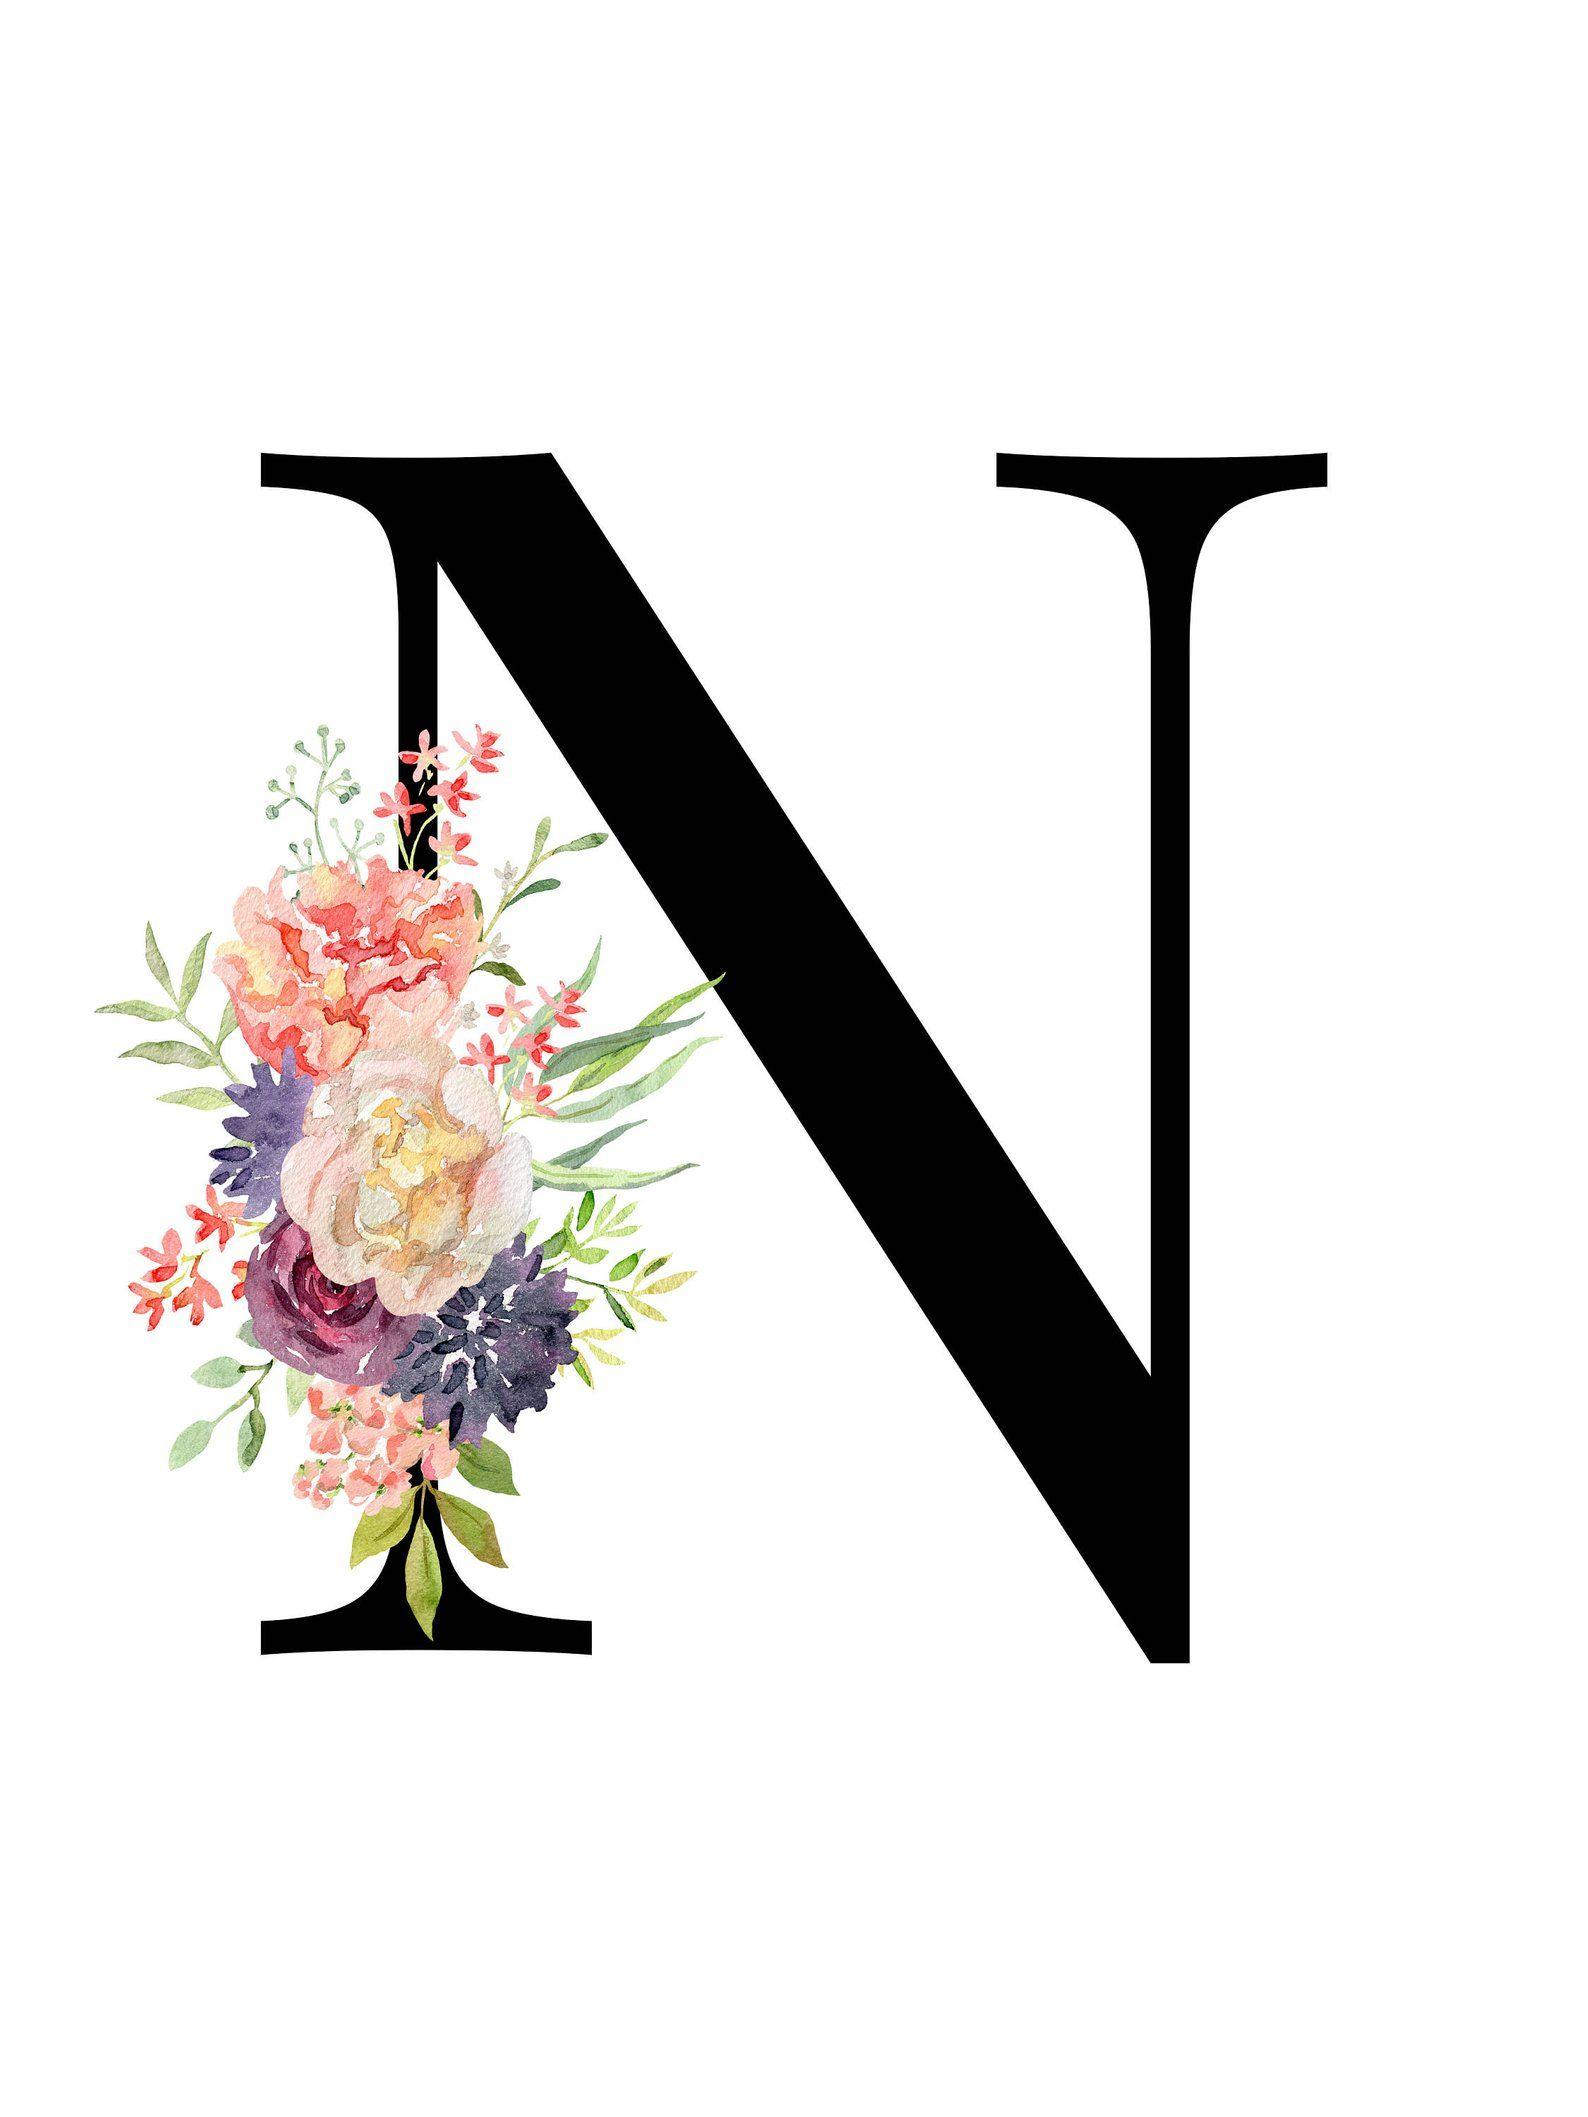 Letter N Floral Monogram Printable Letter Nursery Art Etsy Harfleme Yaratici Fotografcilik Marka Tasarimi